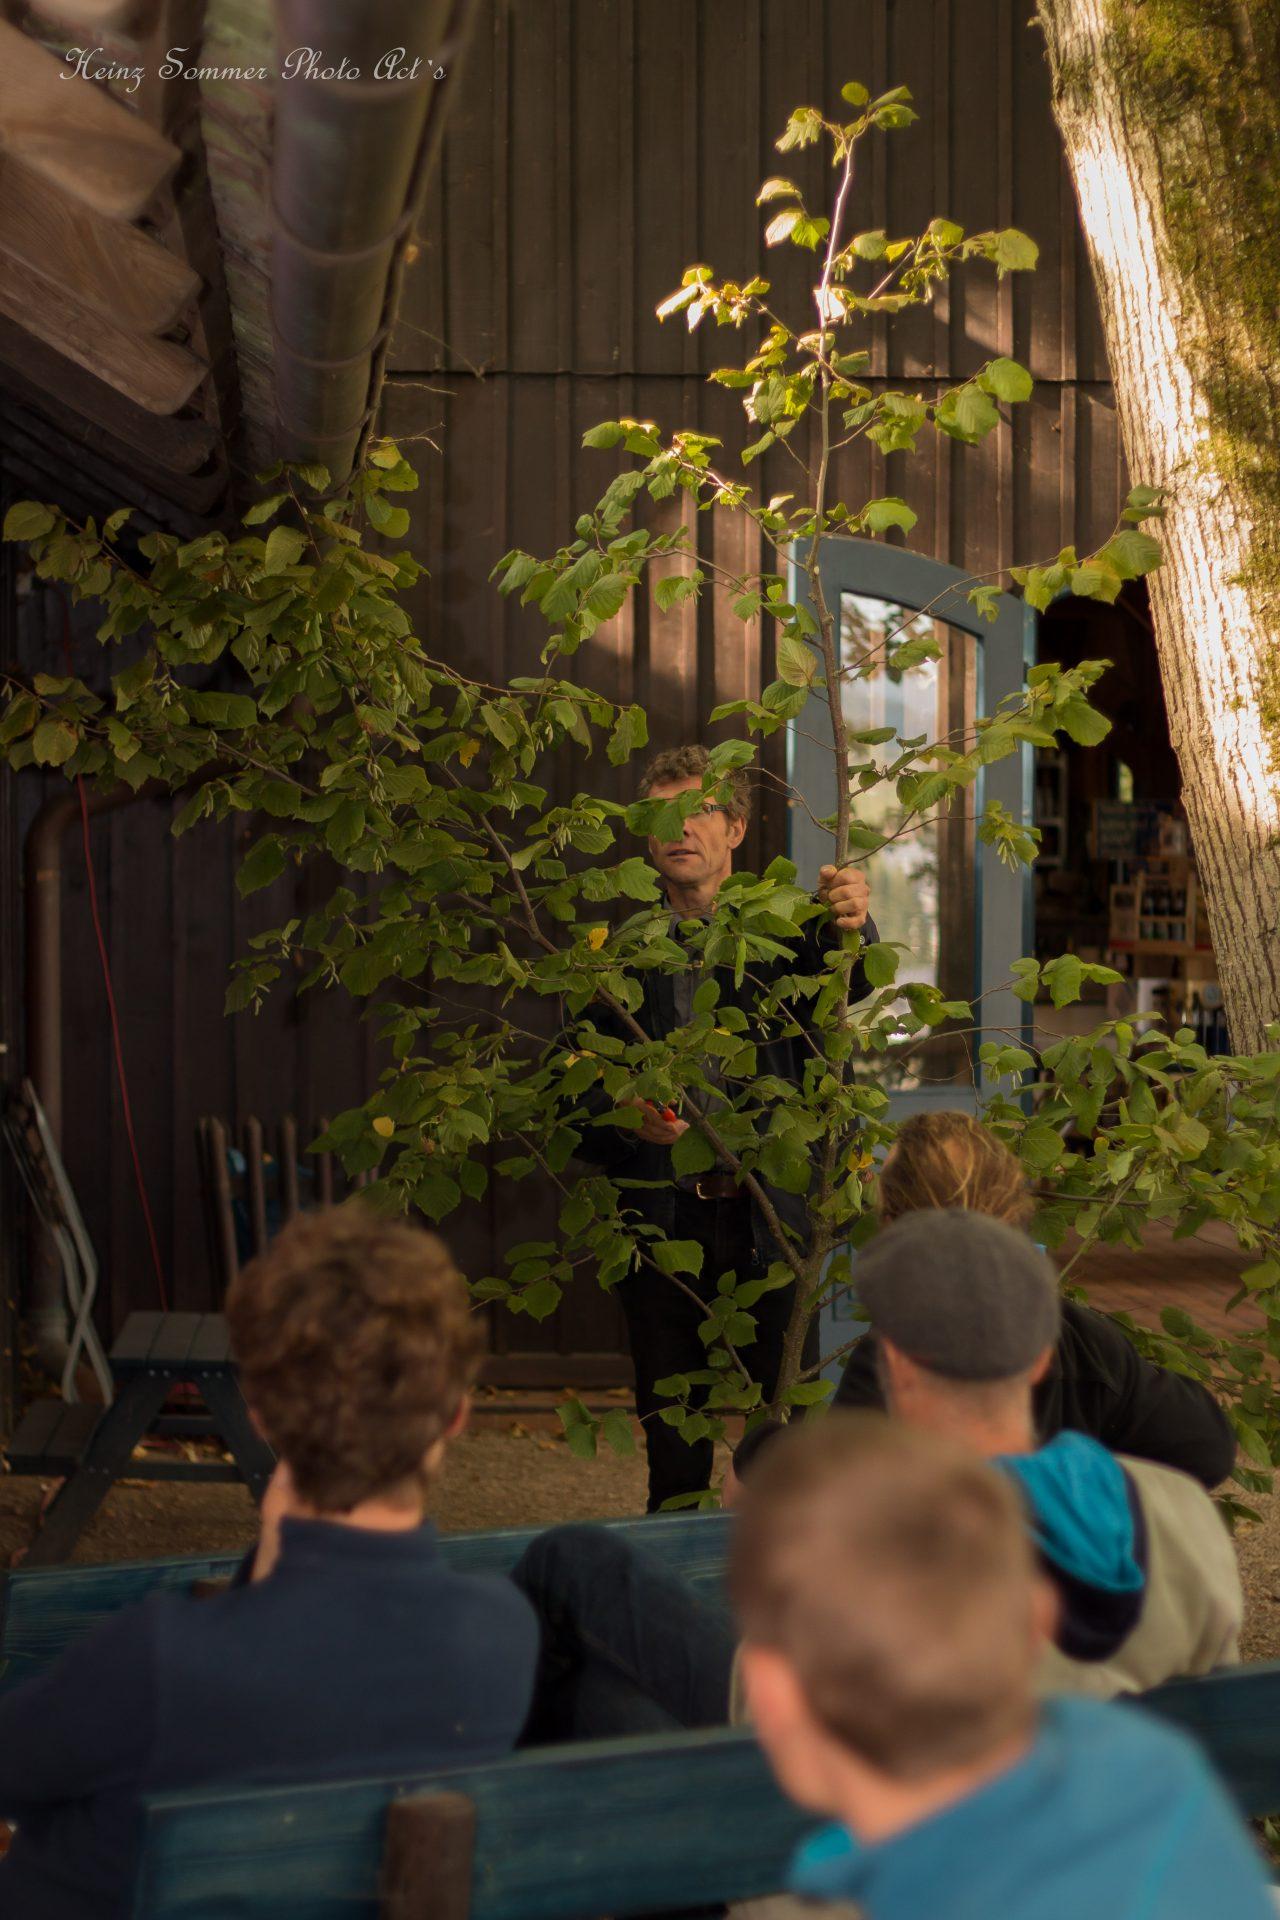 Kai Bergengrün hält Vortrag über Schlankschnitt in Buttenheim bei Bamberg - Busch Baumpflege